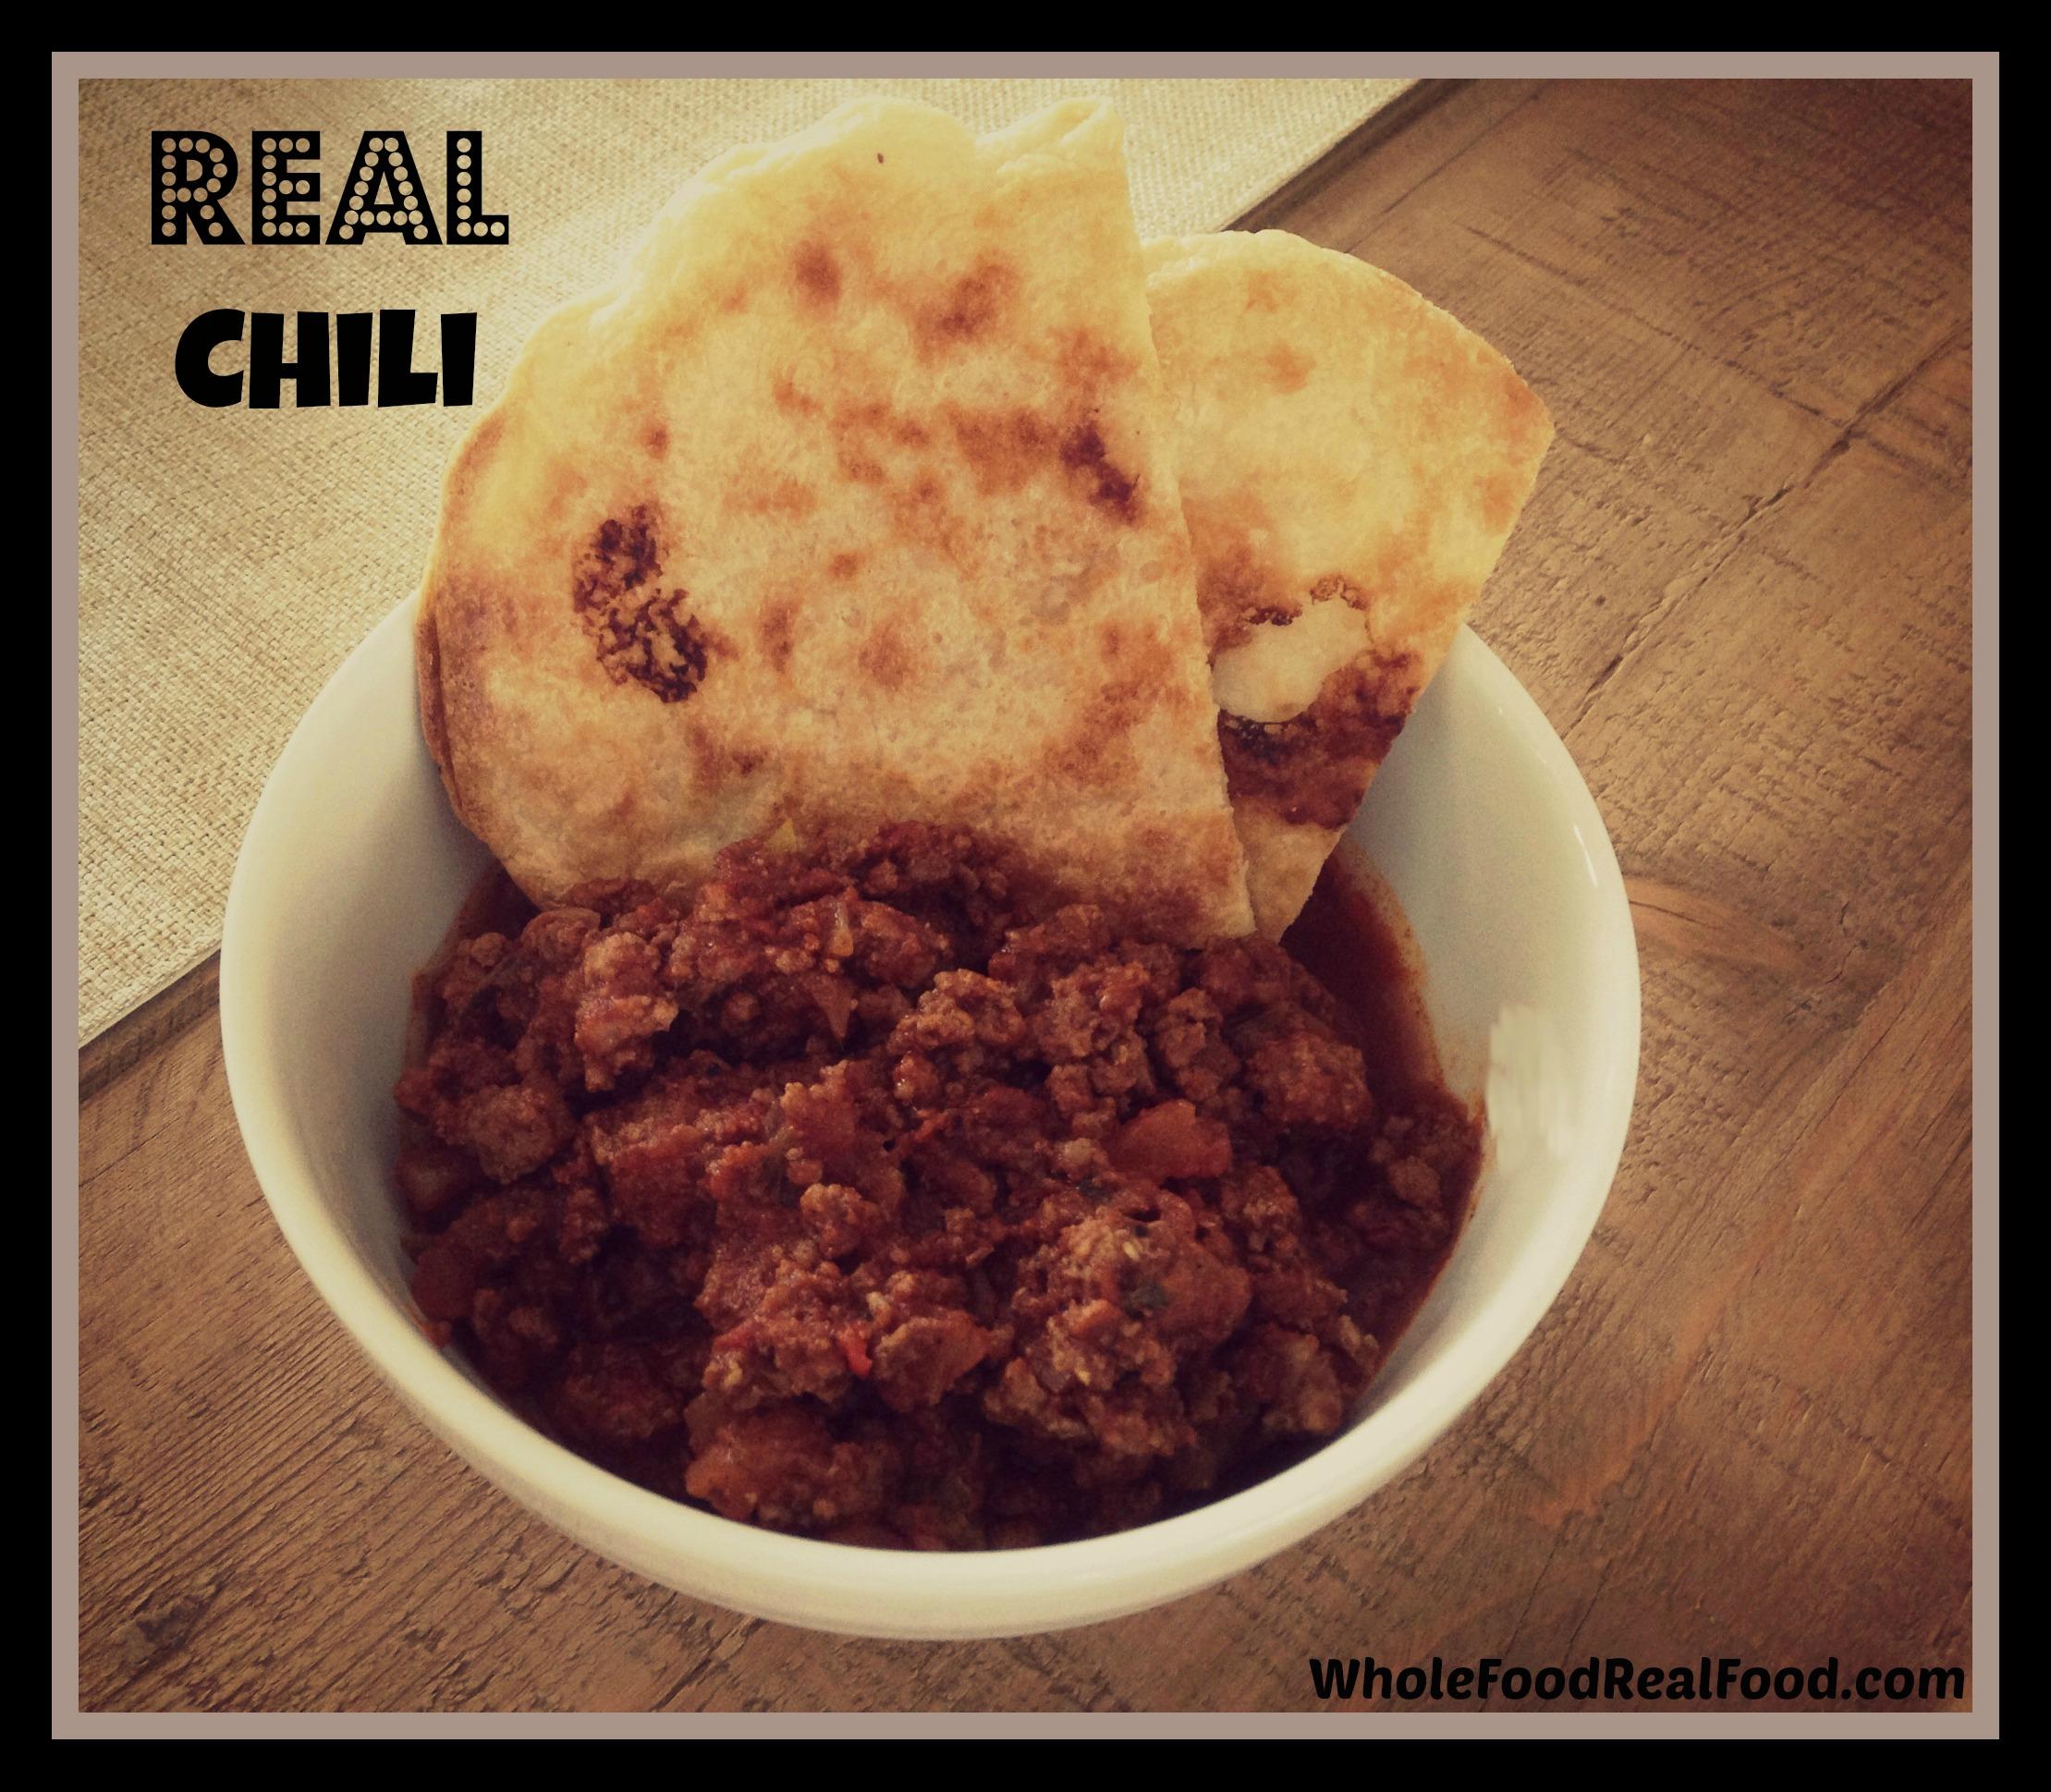 Real Chili